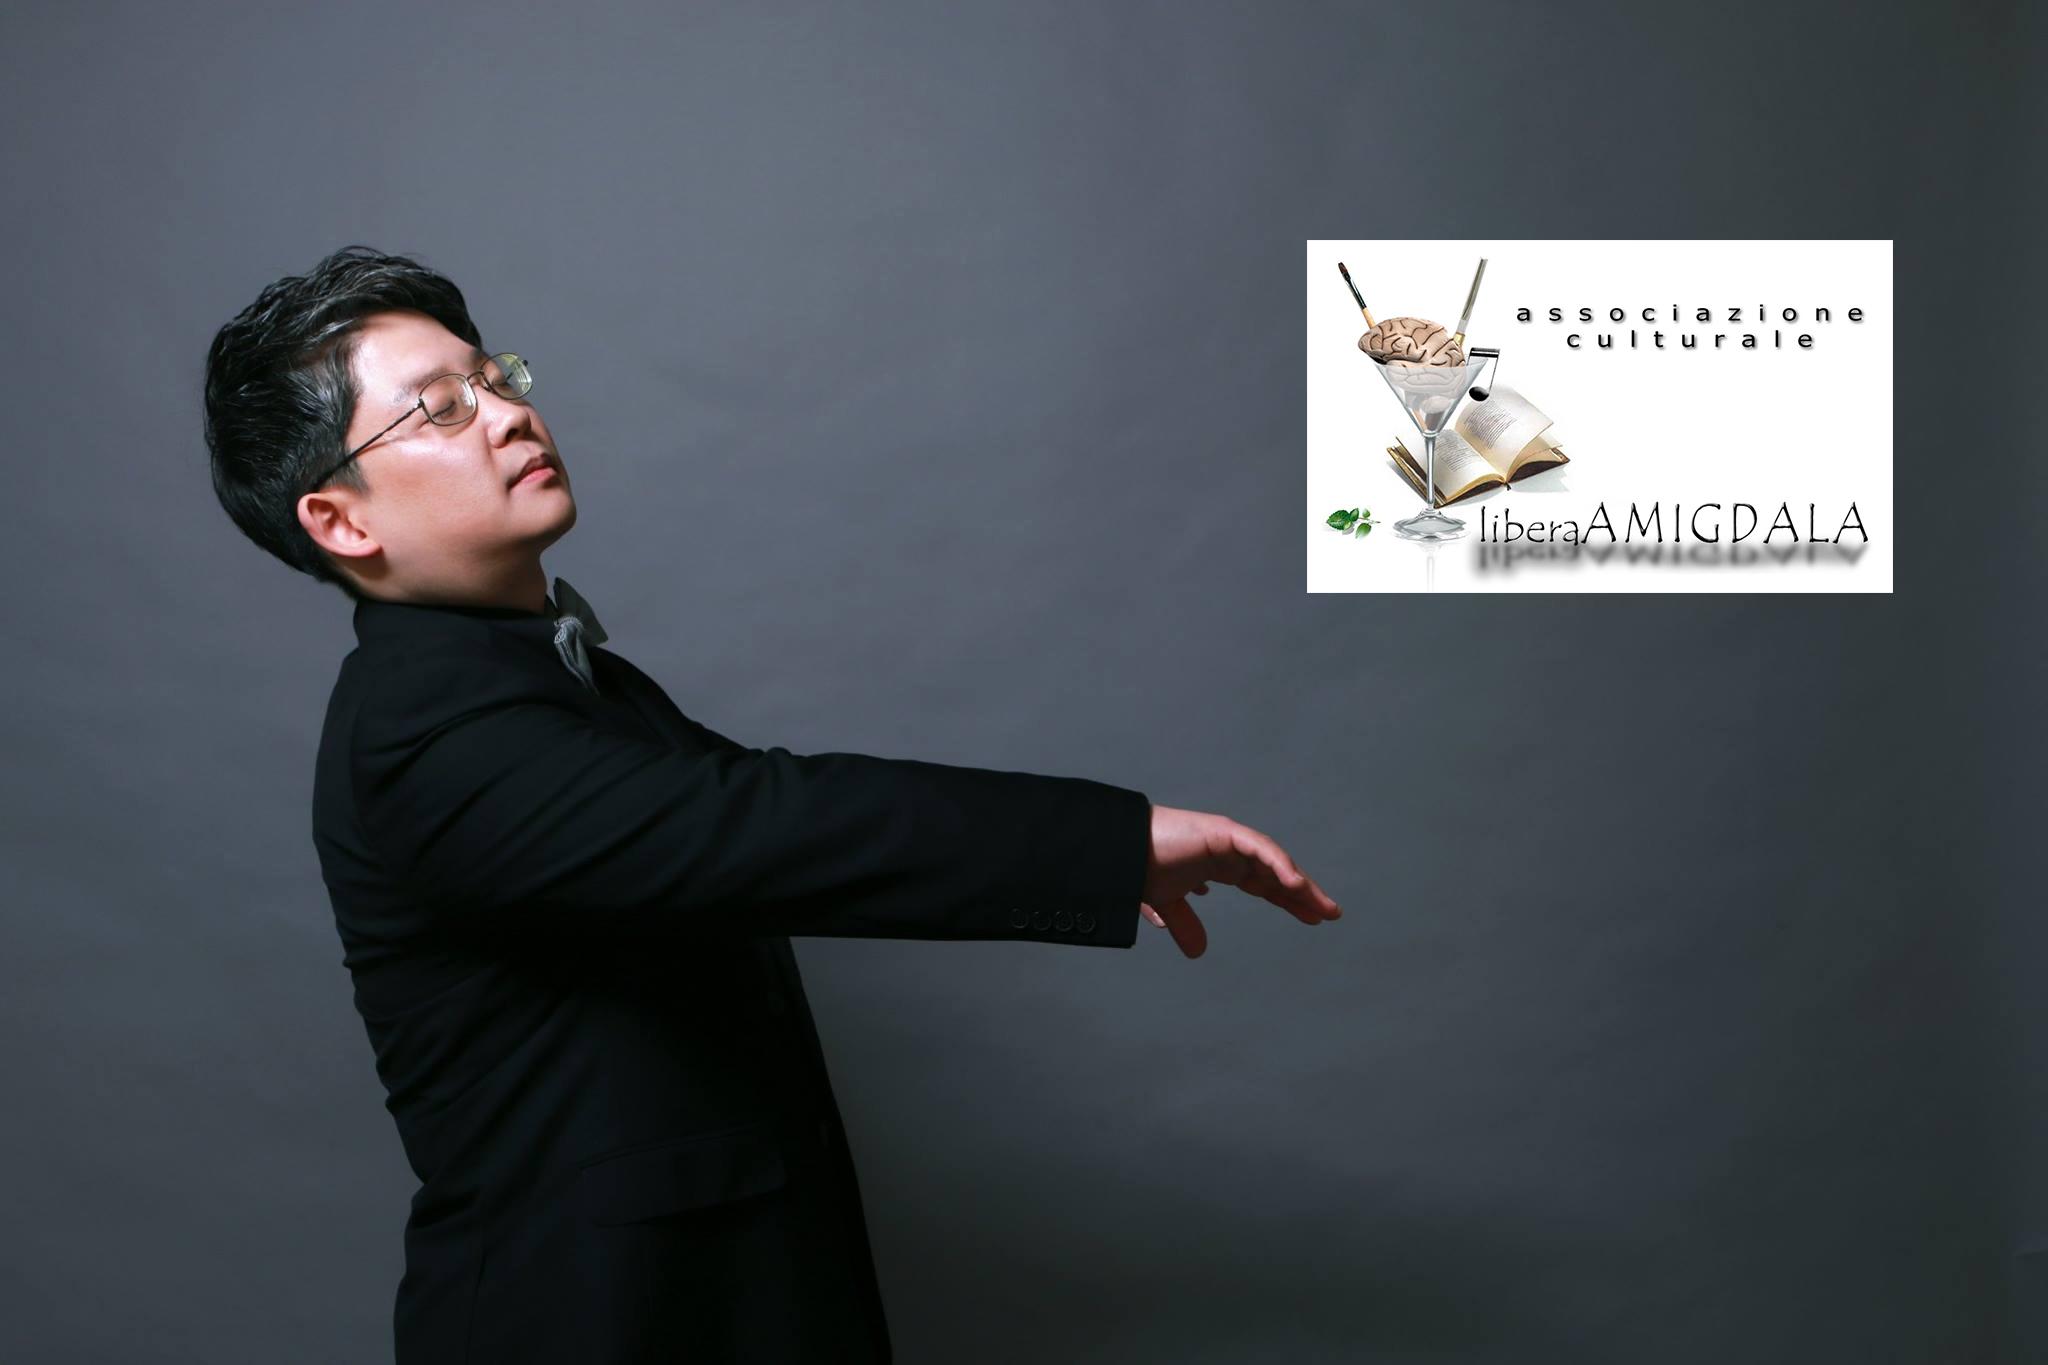 Sunghoon Simon Hwang - Amigdala